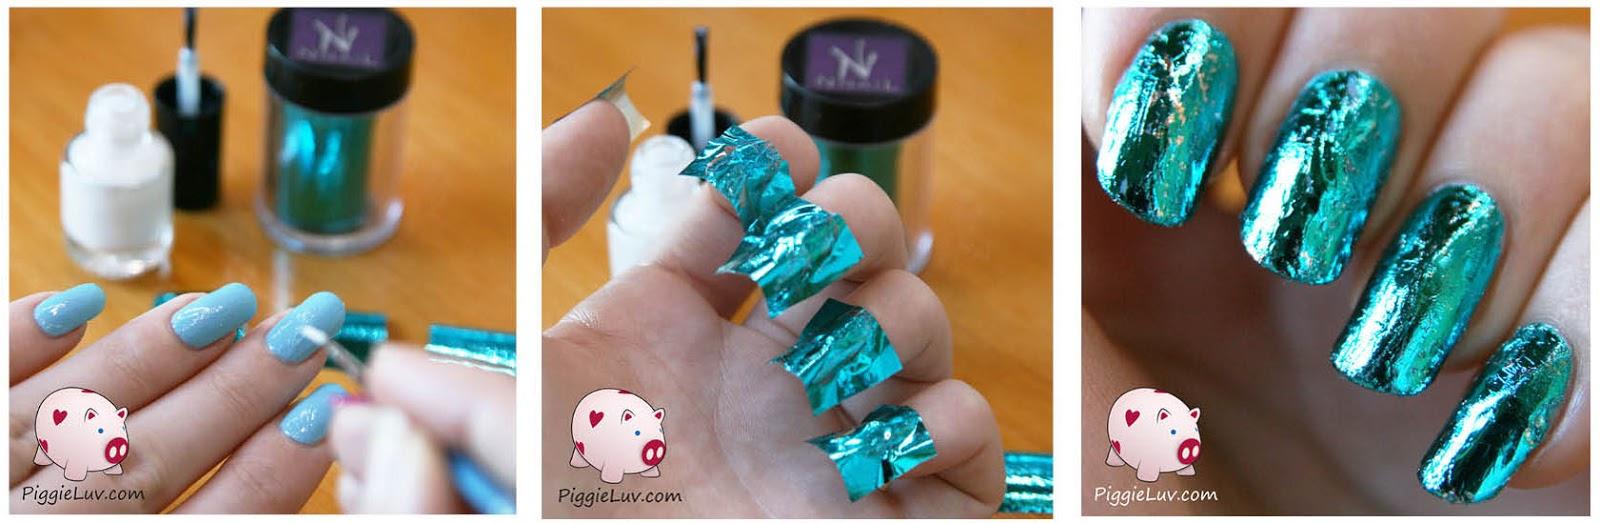 Foil Glue For Nails | Best Nail Designs 2018